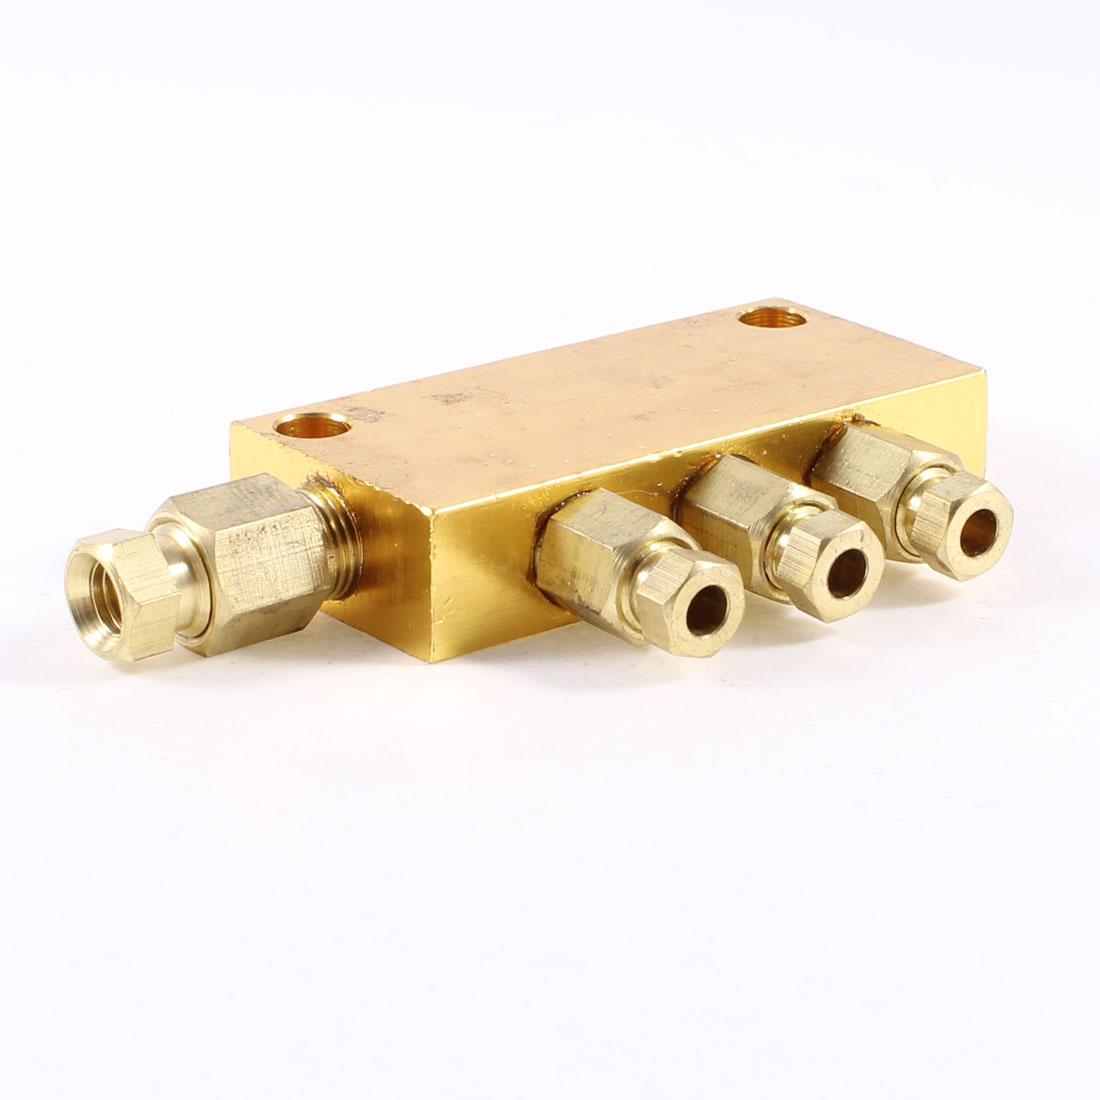 Air Pneumatic Brass Adjustable 3 Ways Oil Distributor Regulating Manifold Block